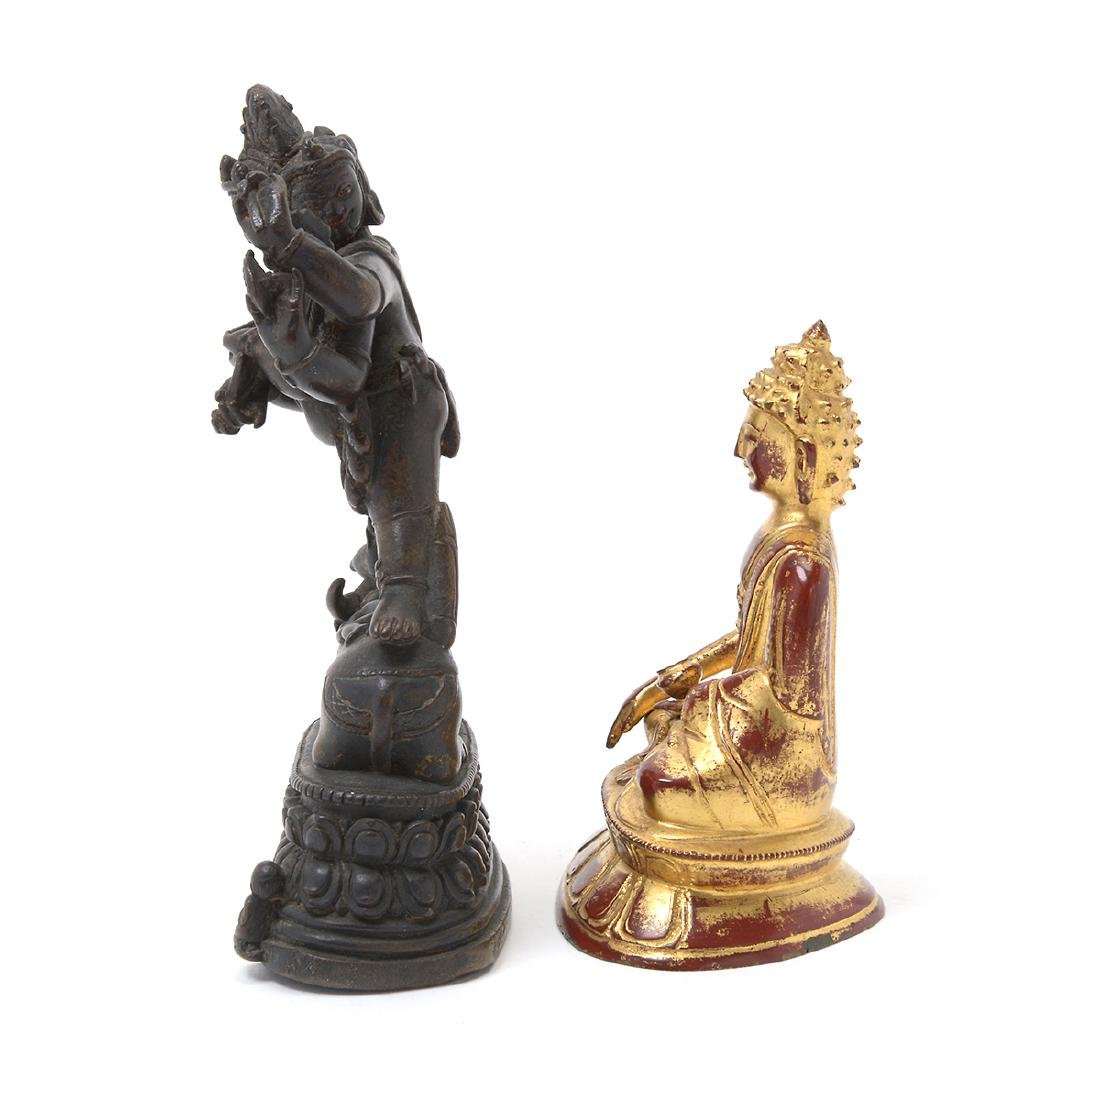 Two Bronze Buddhist Figures, 17th/18th Century - 6